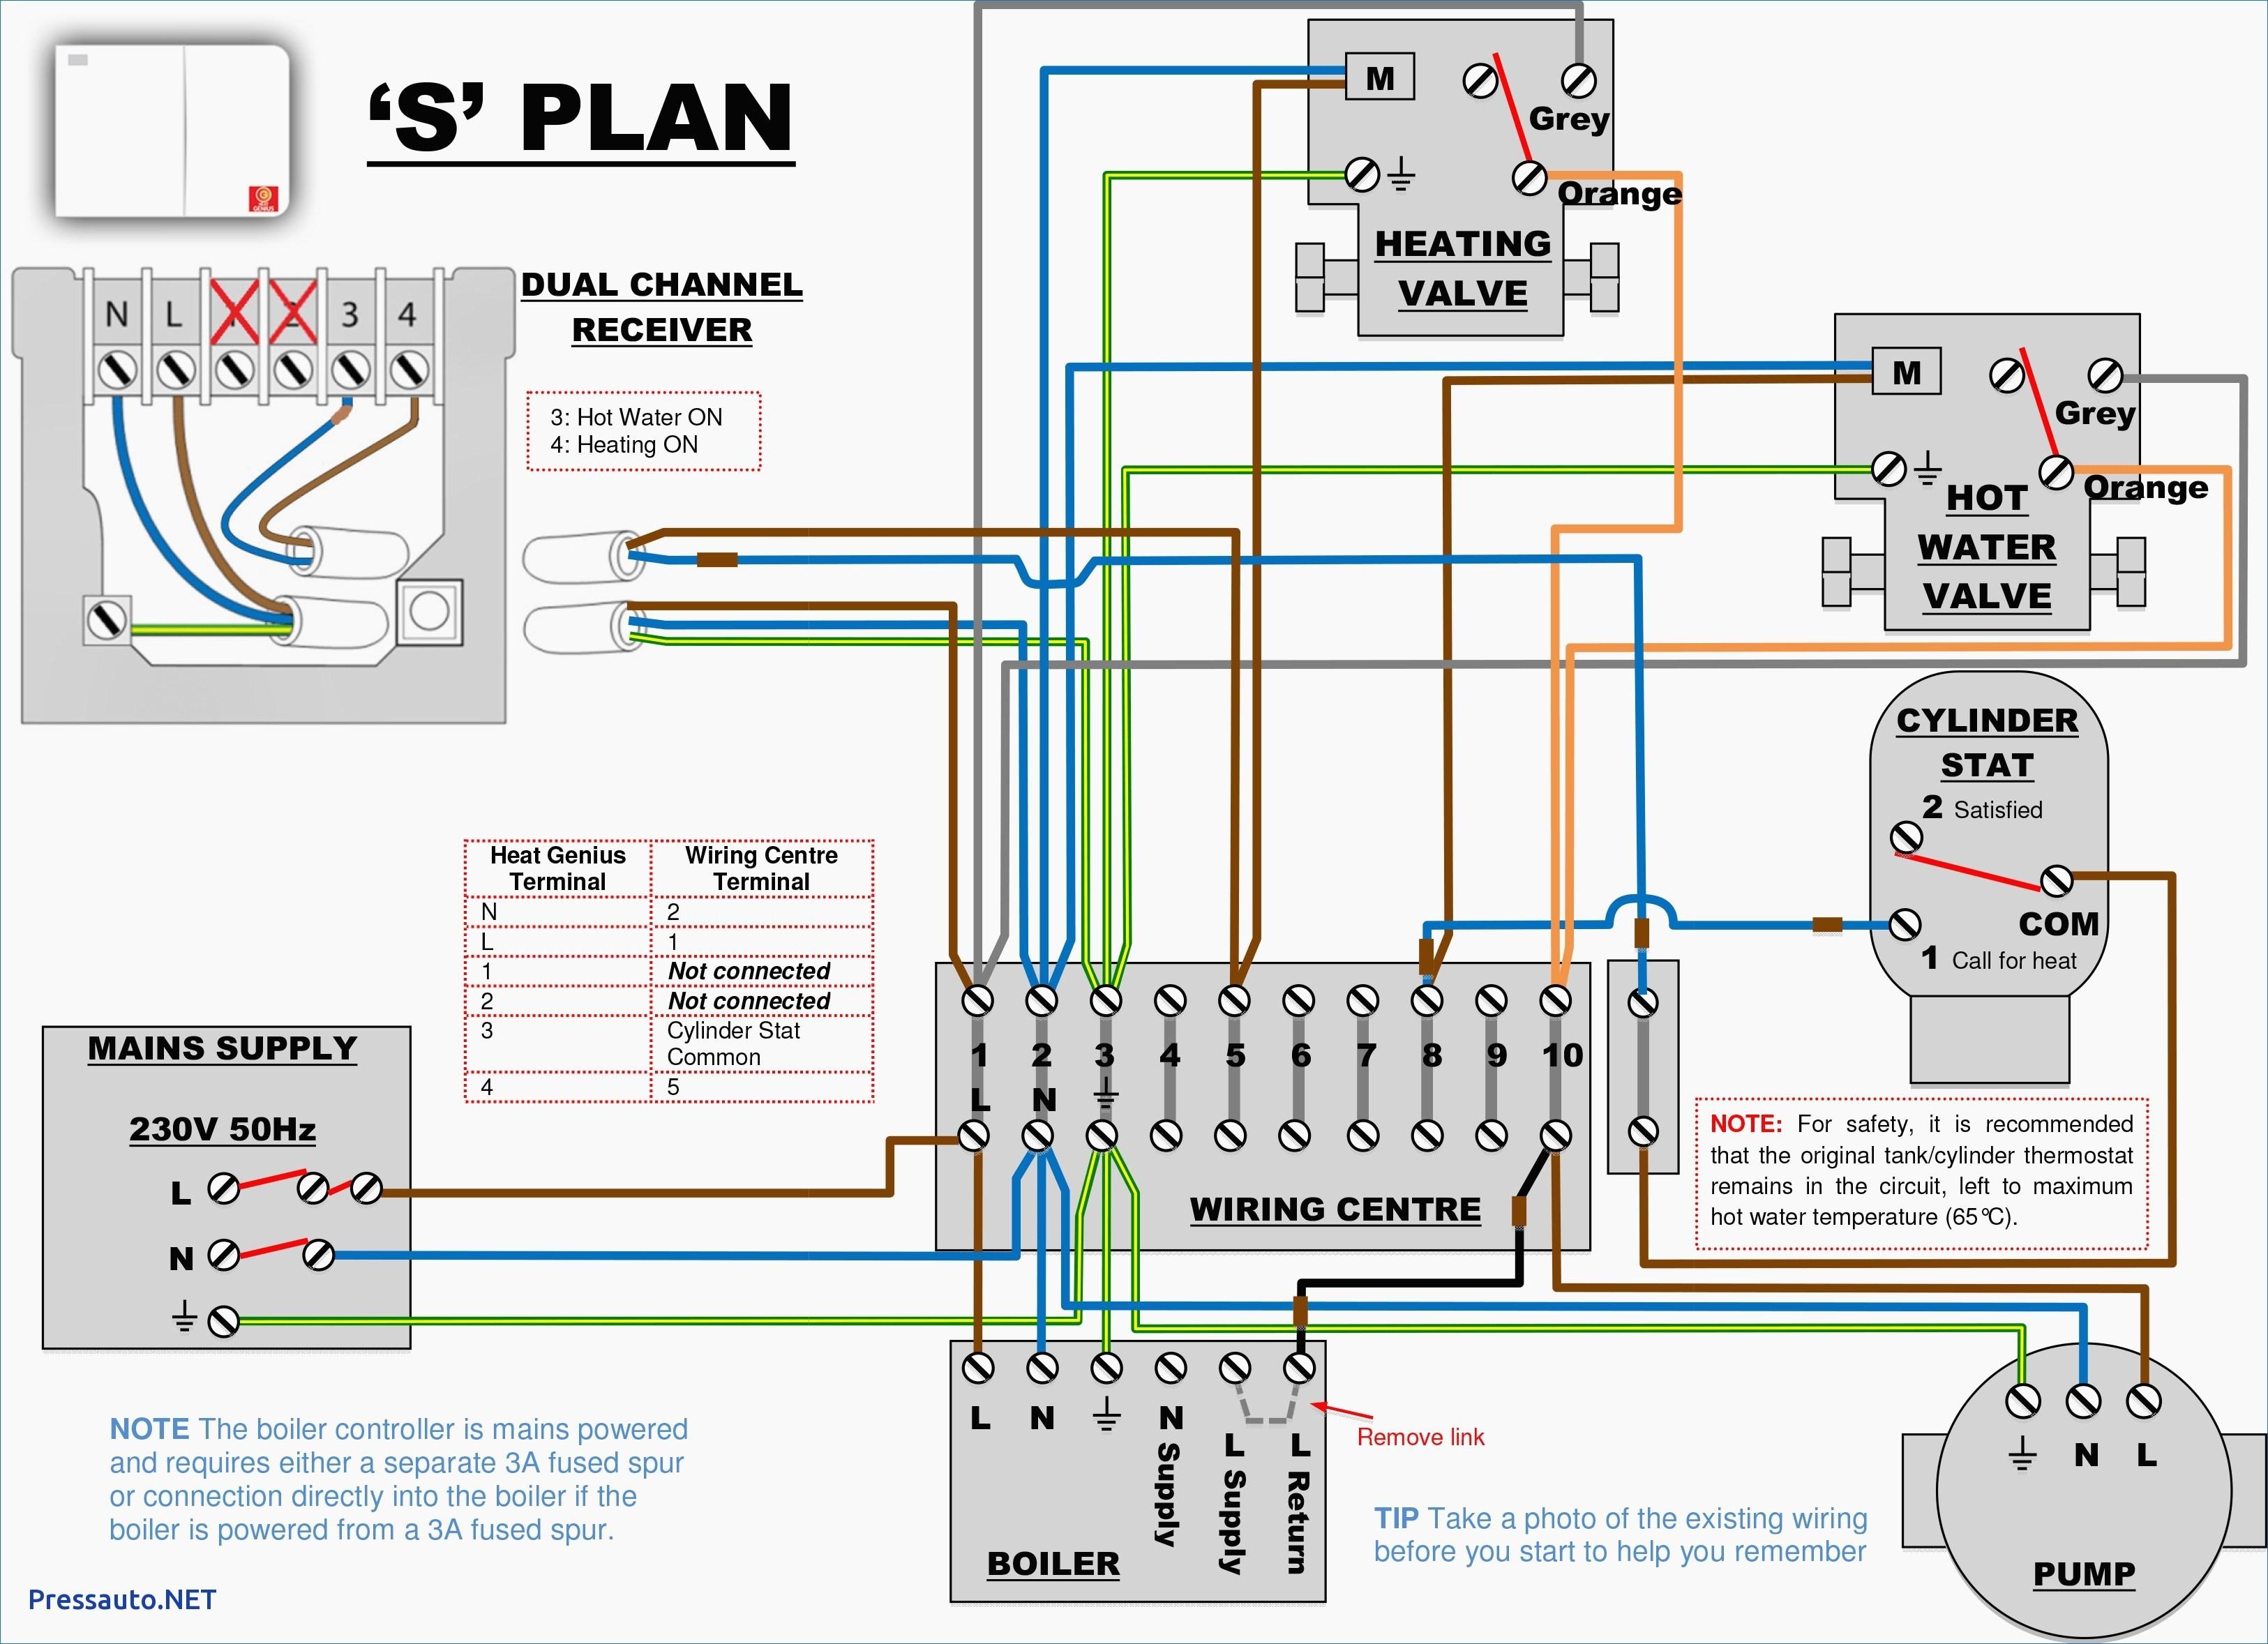 Carrier Heat Pump Wiring Diagram Elegant Heat Pump thermostat Wiring Diagram Diagram Of Carrier Heat Pump Wiring Diagram